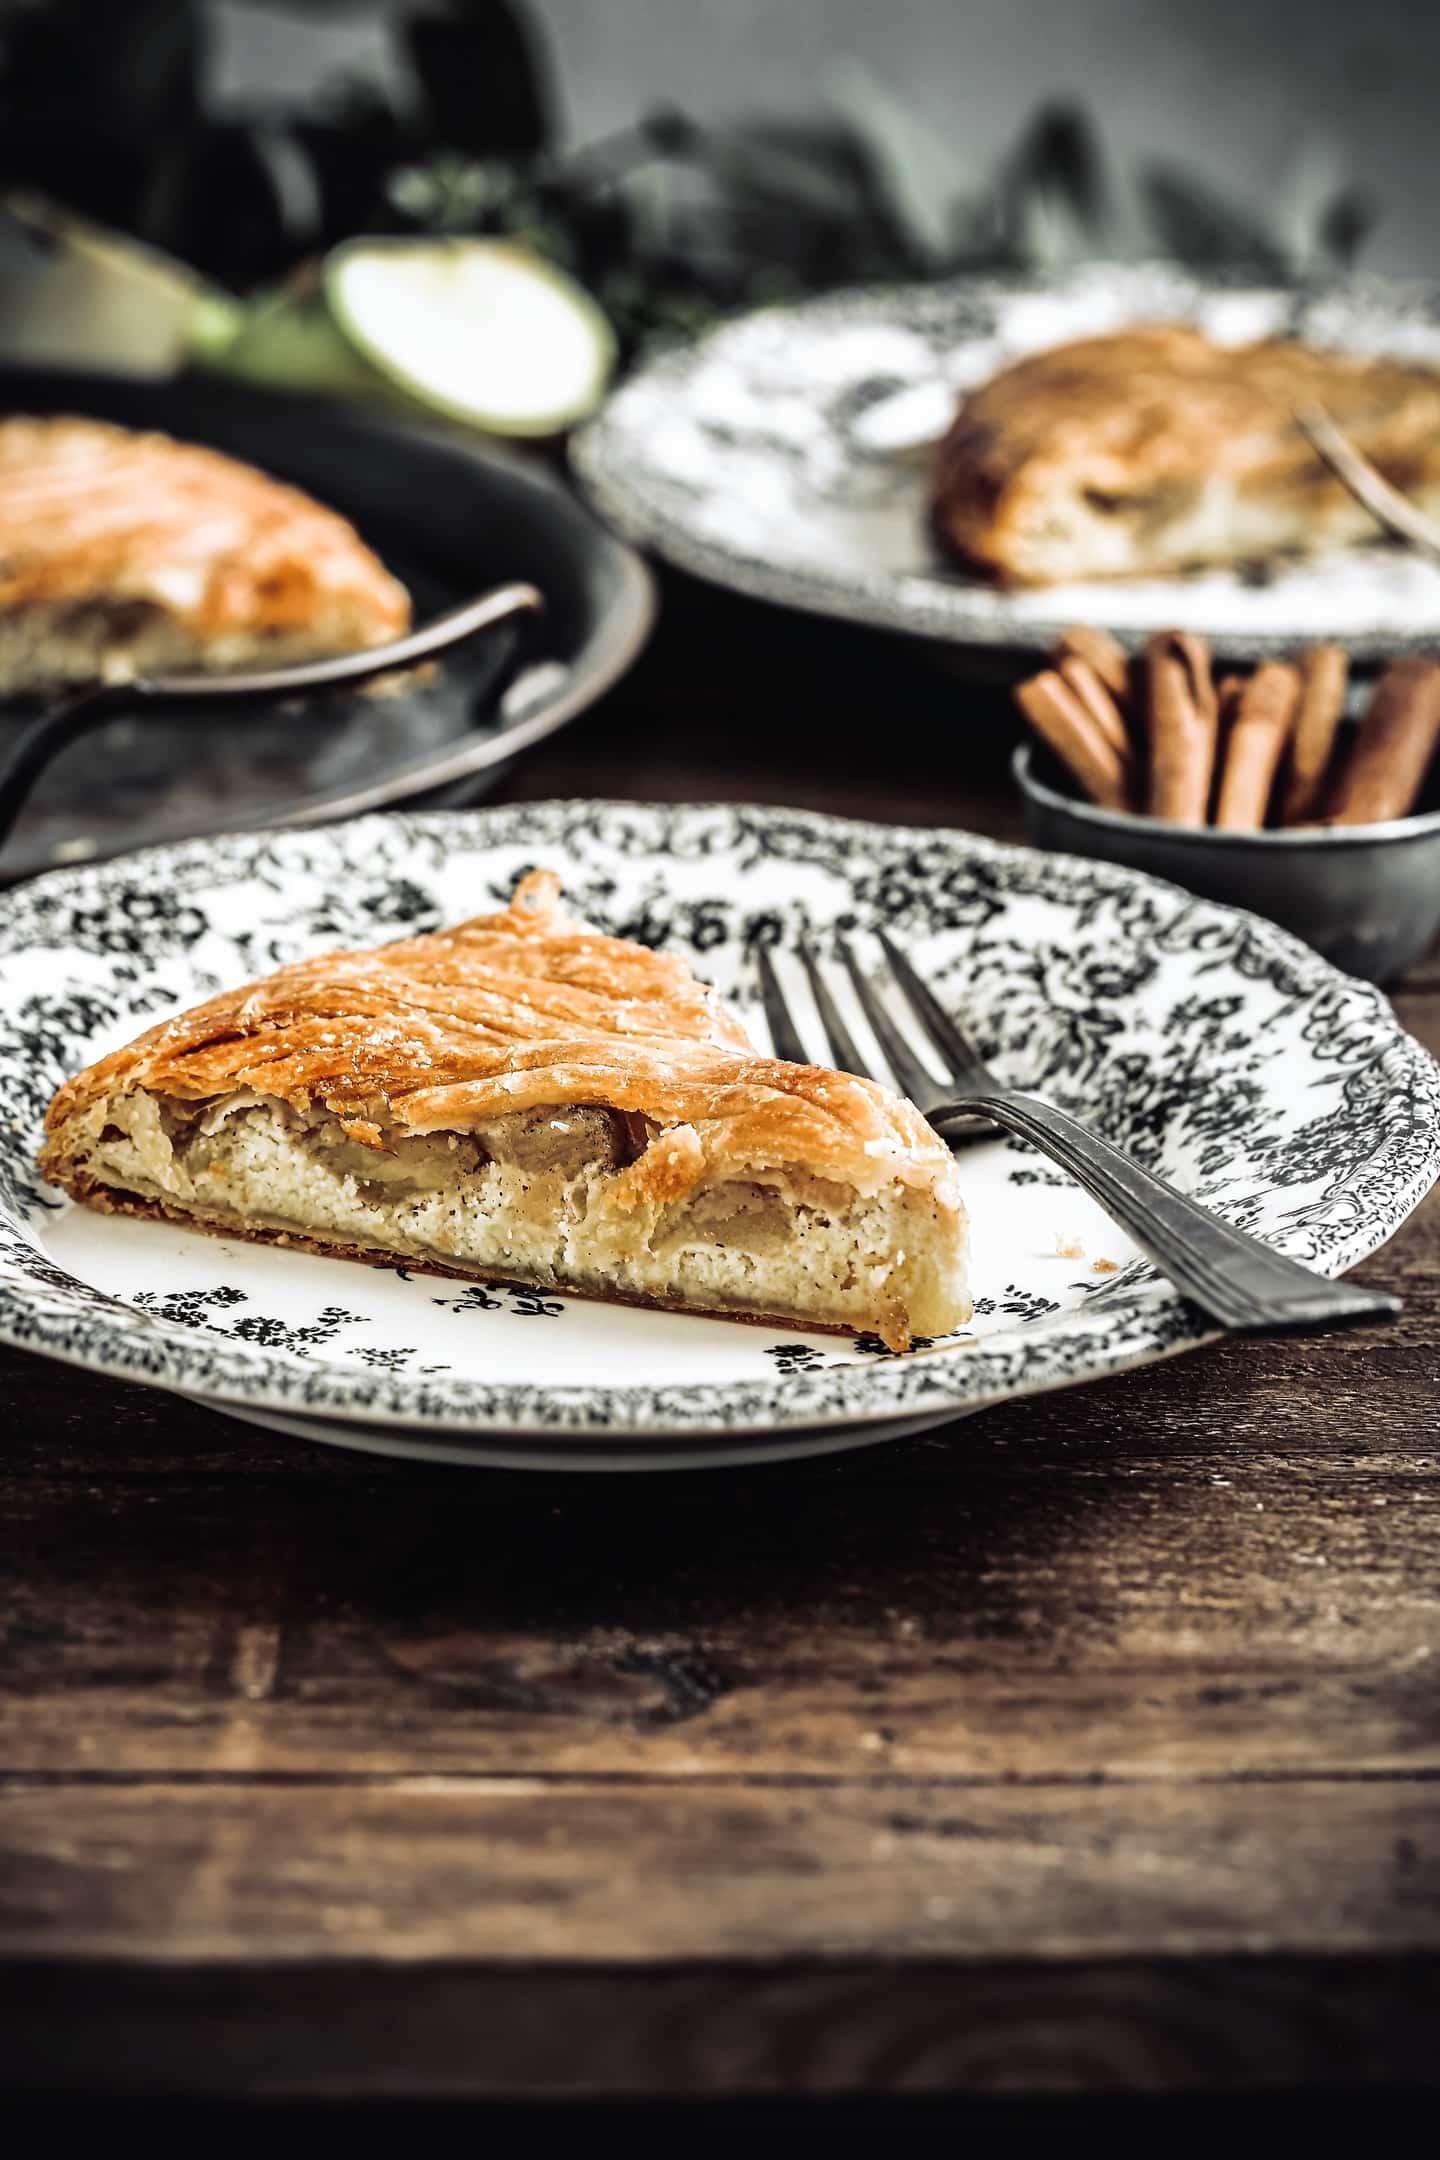 Homemade french apple galette des rois